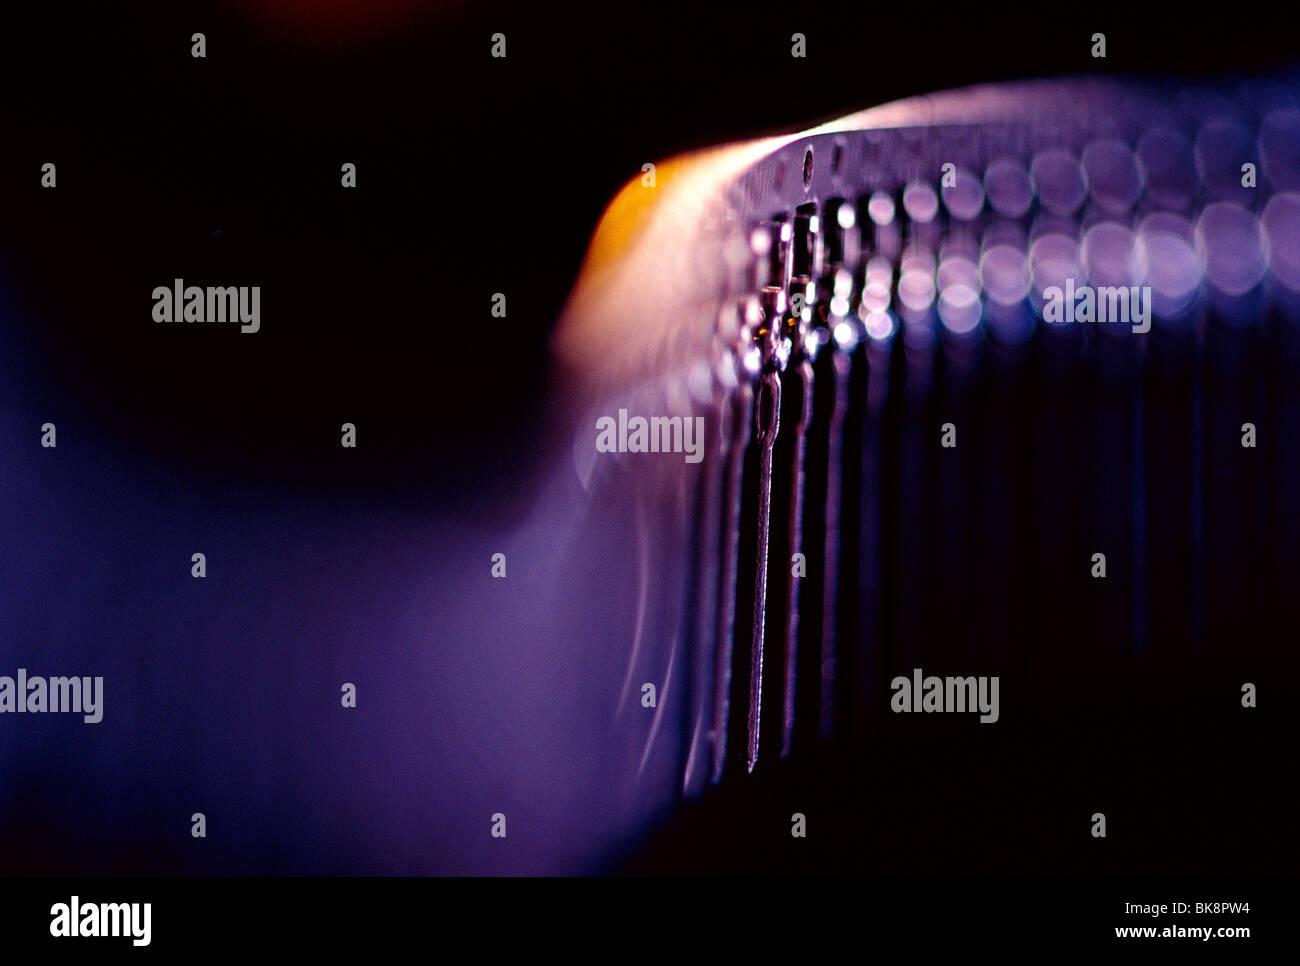 Resumen vista cercana del circuito impreso pasadores usados en circuitos de computadora. Imagen De Stock